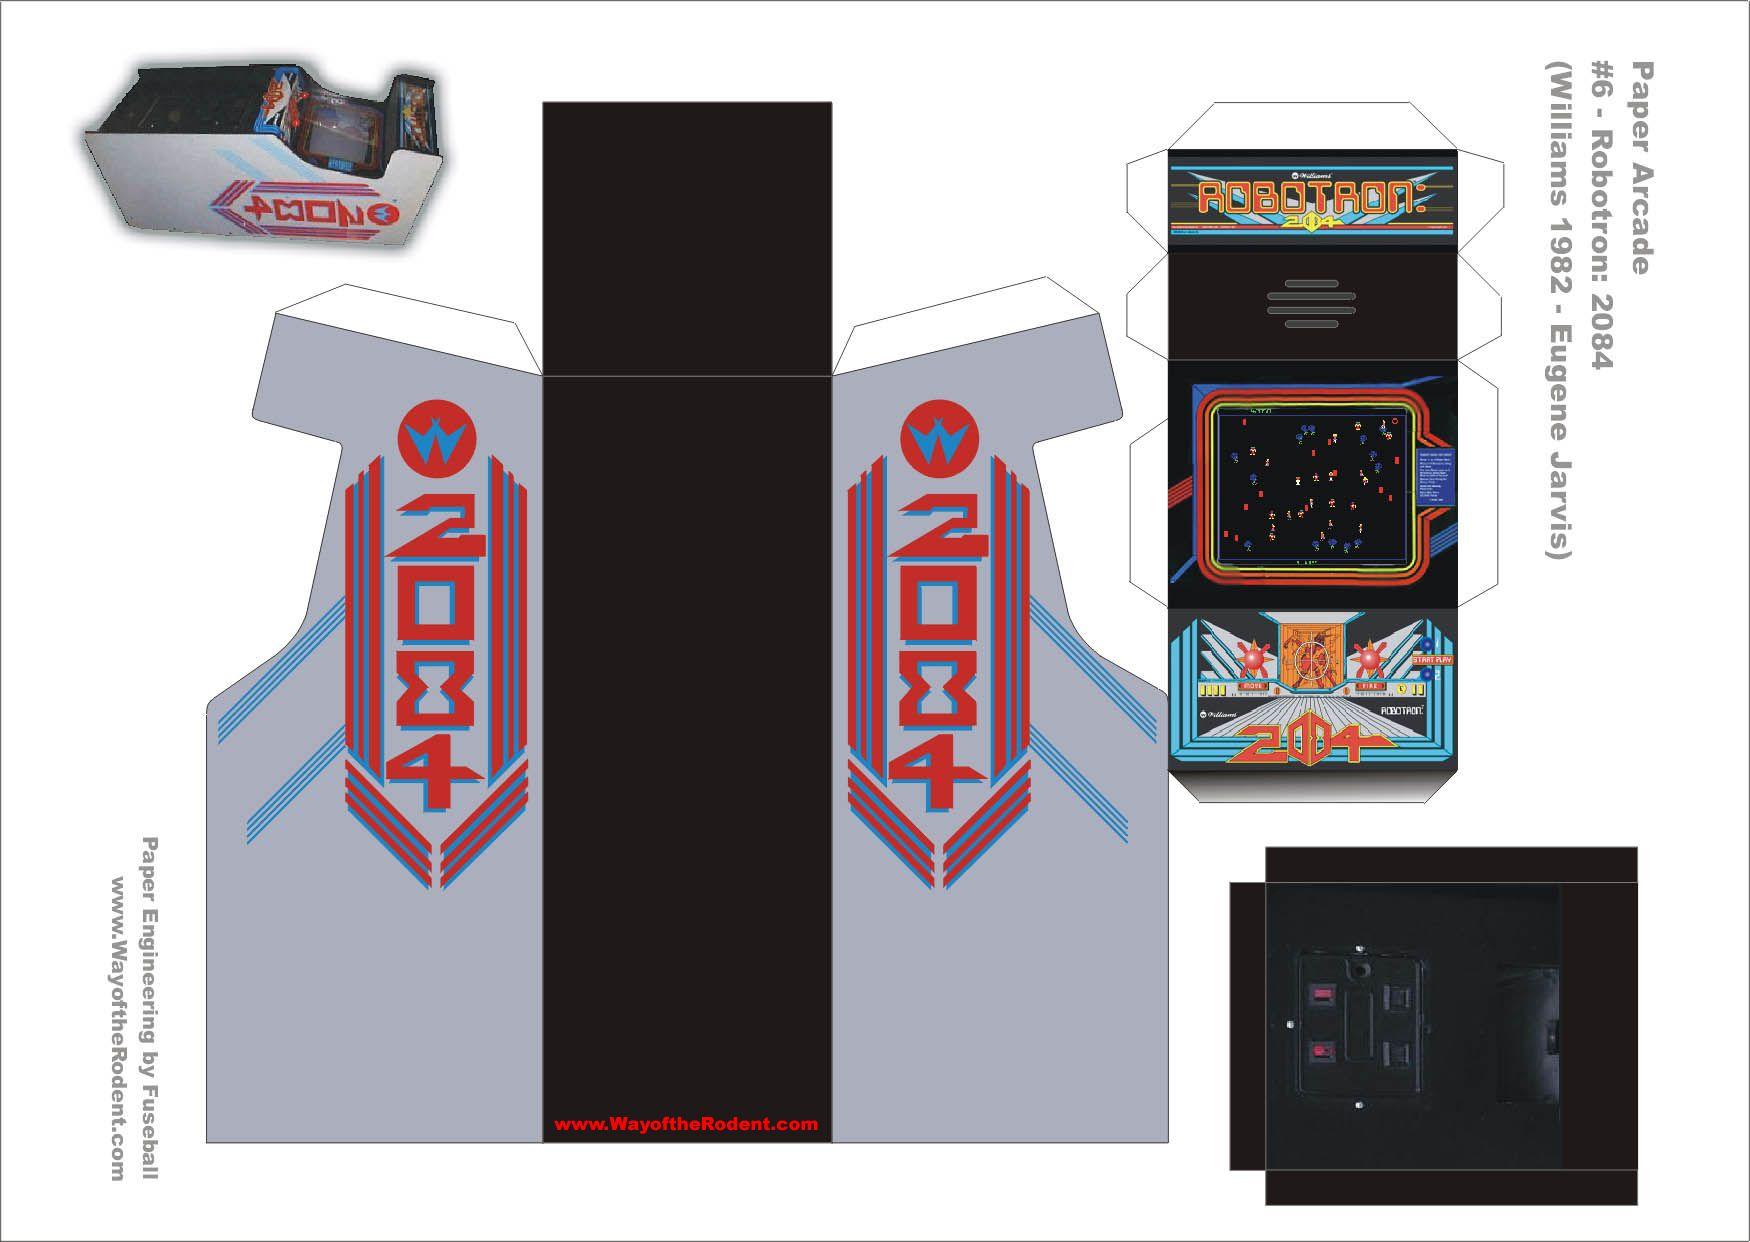 robotron arcade machine